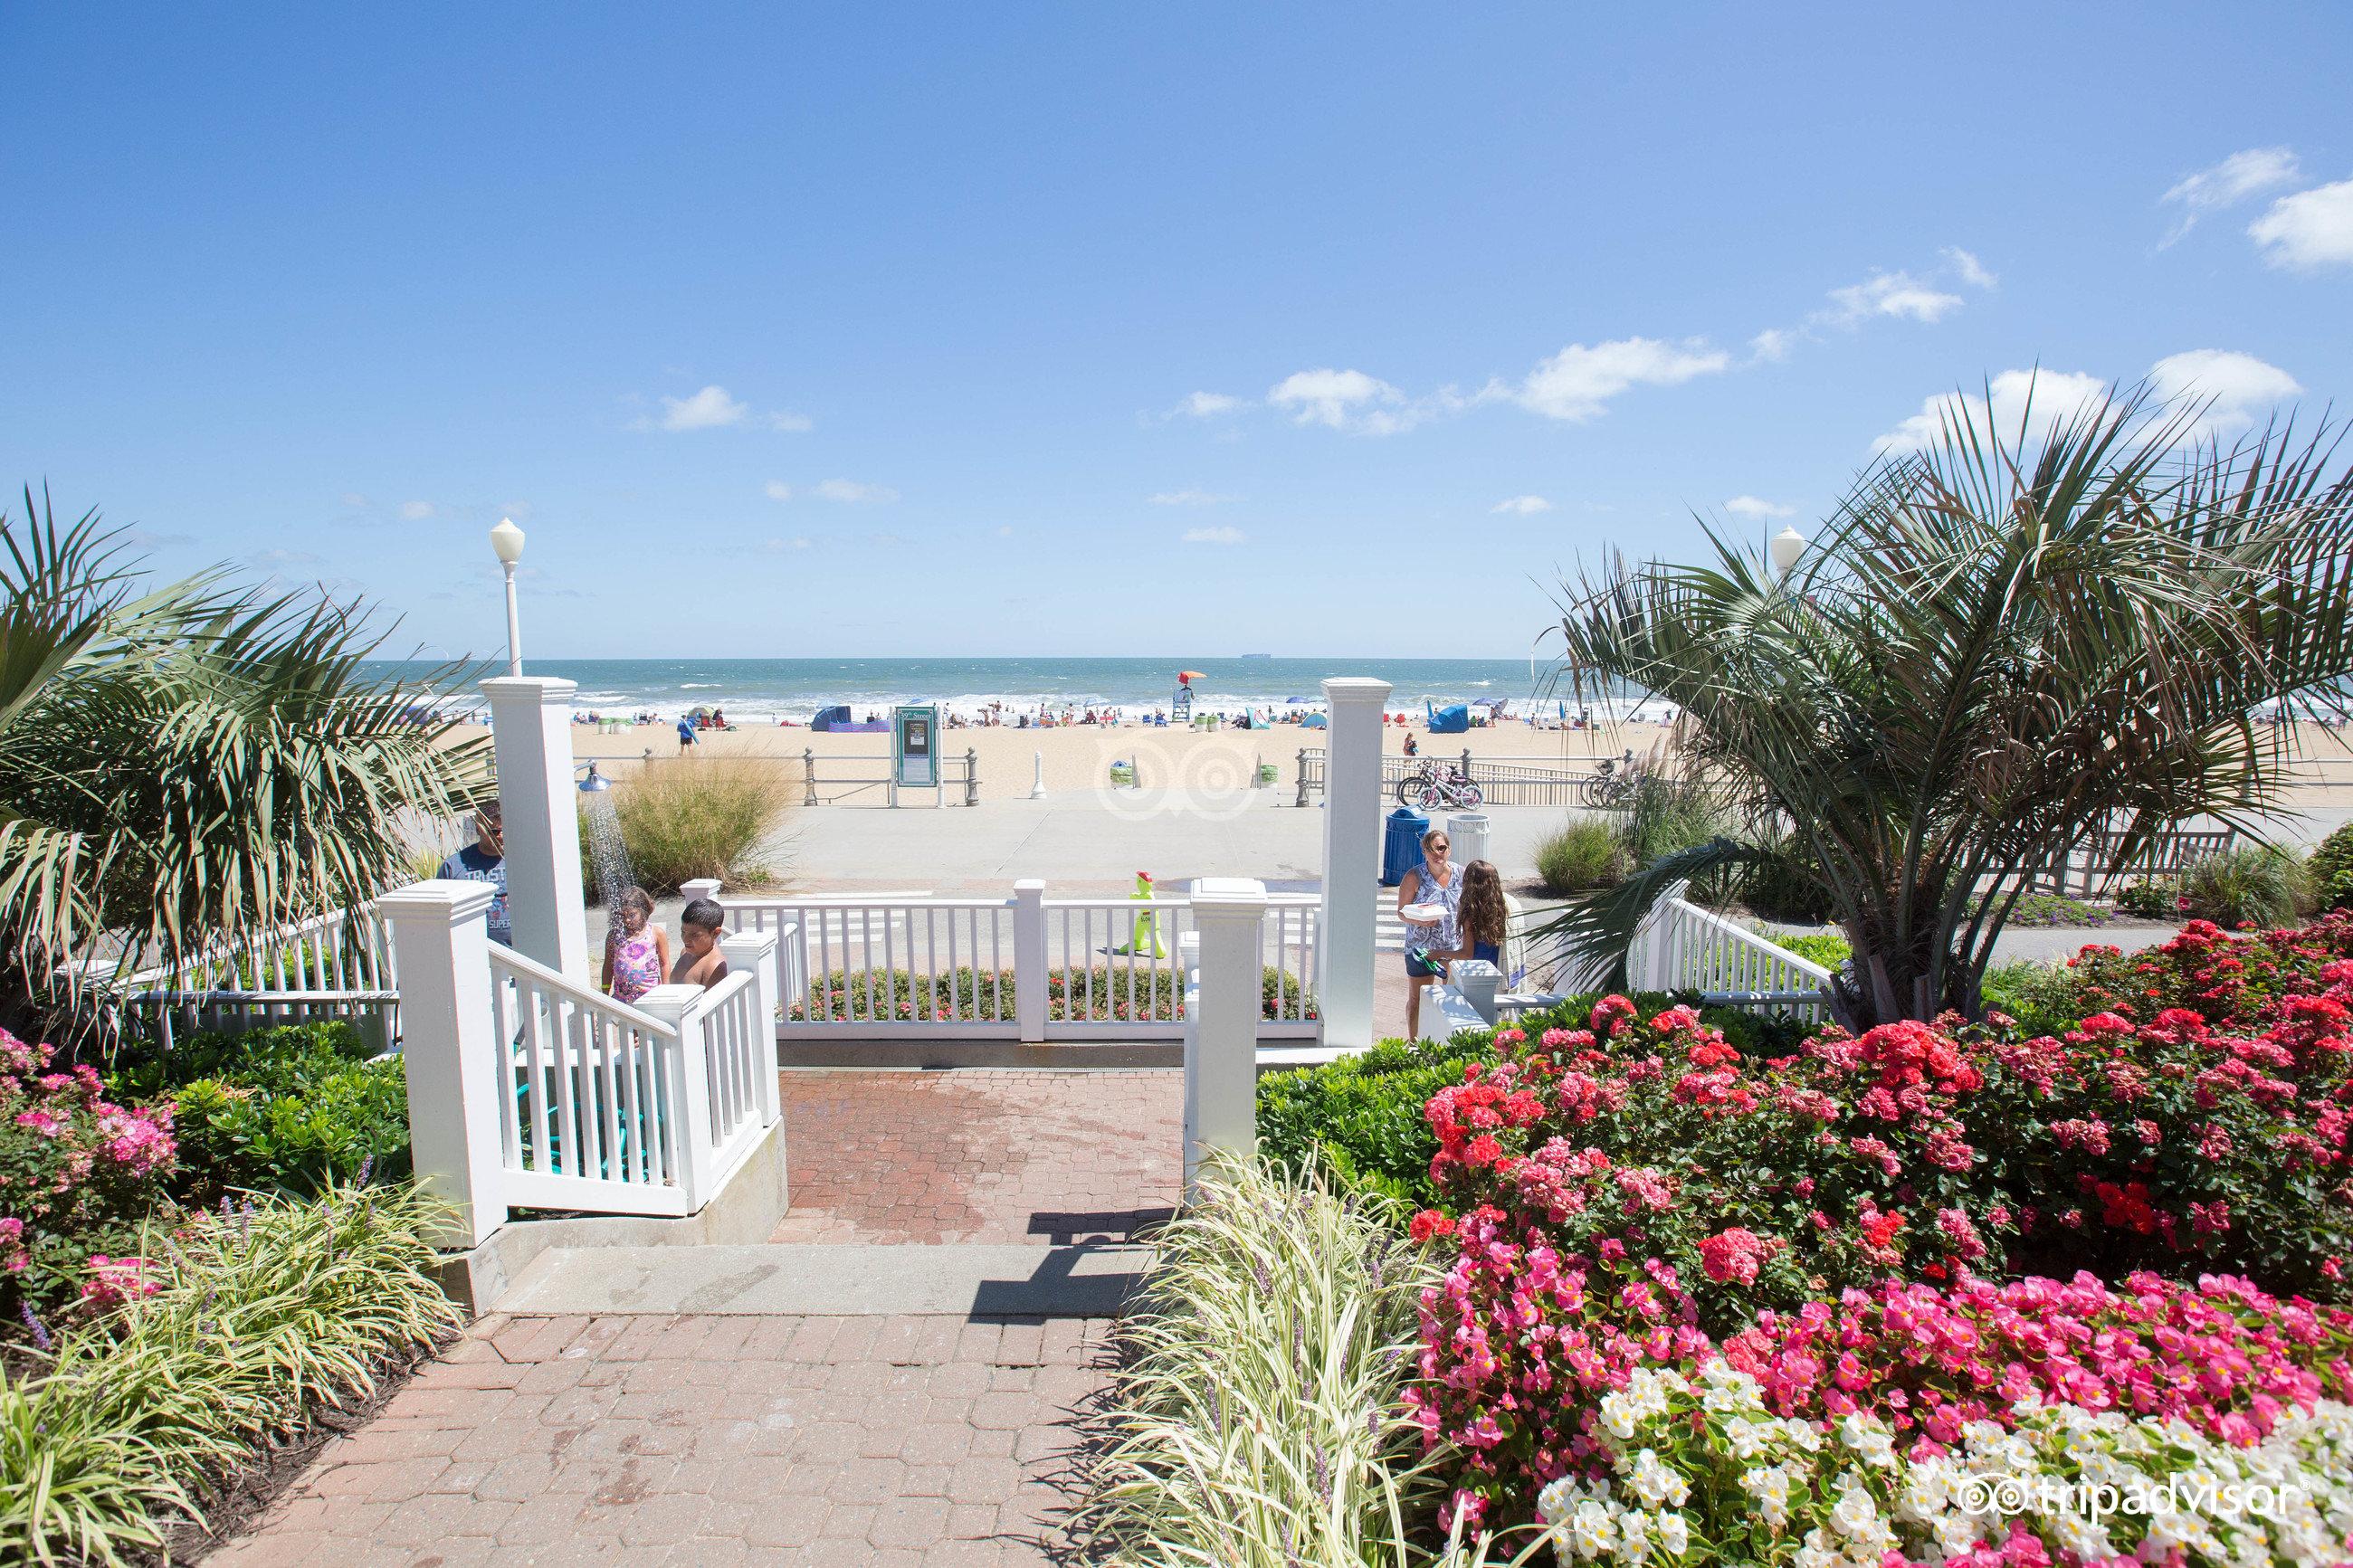 holiday inn suites north beach virginia beach va 2018 hotel